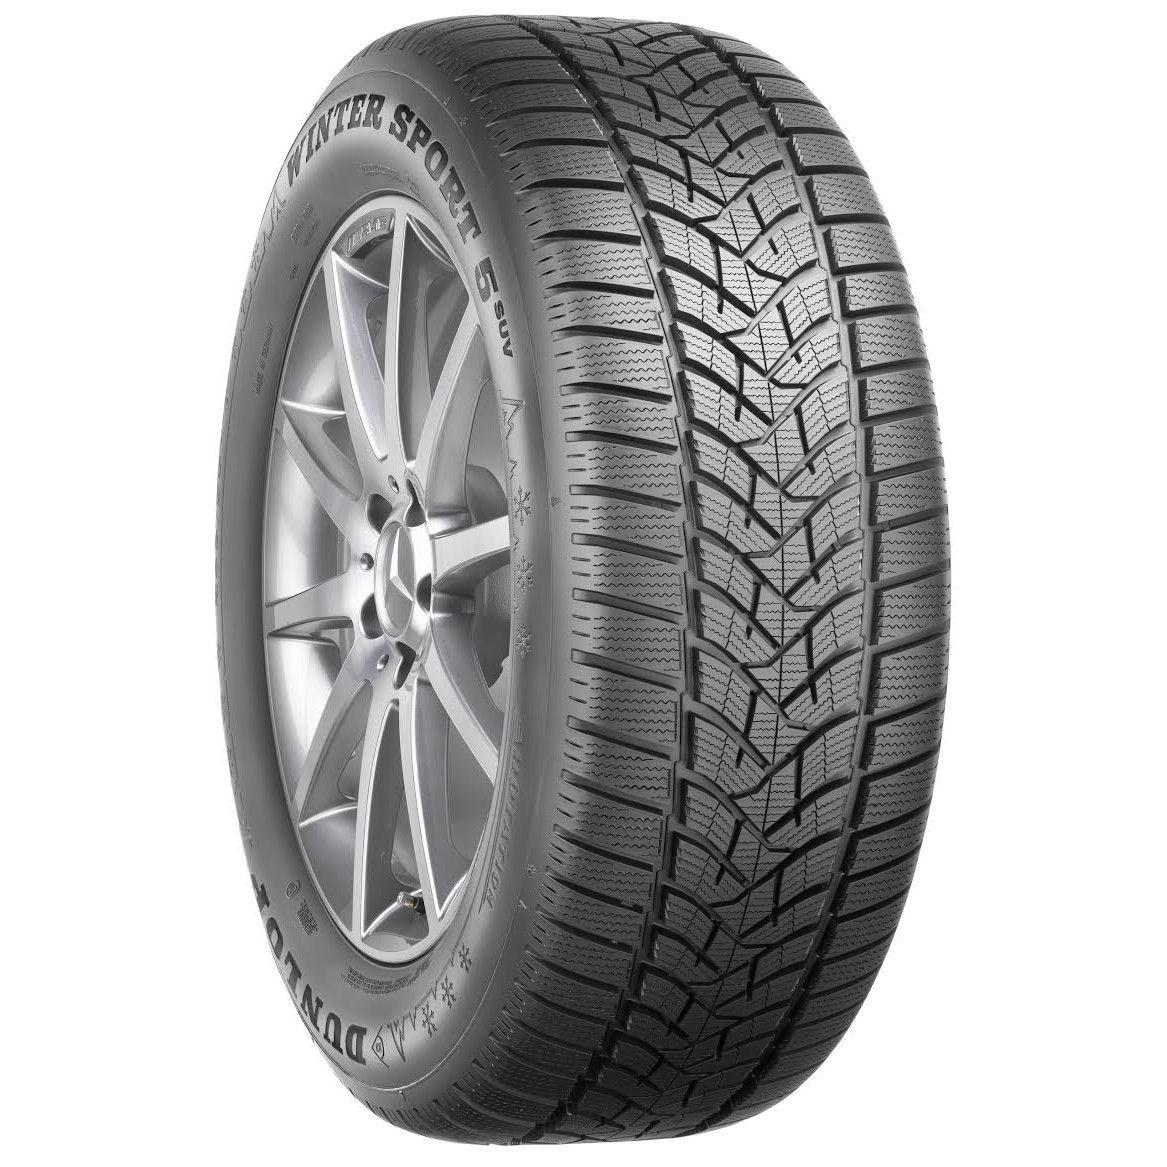 Anvelope Dunlop Winspt5suv 215/70R16 100T Iarna